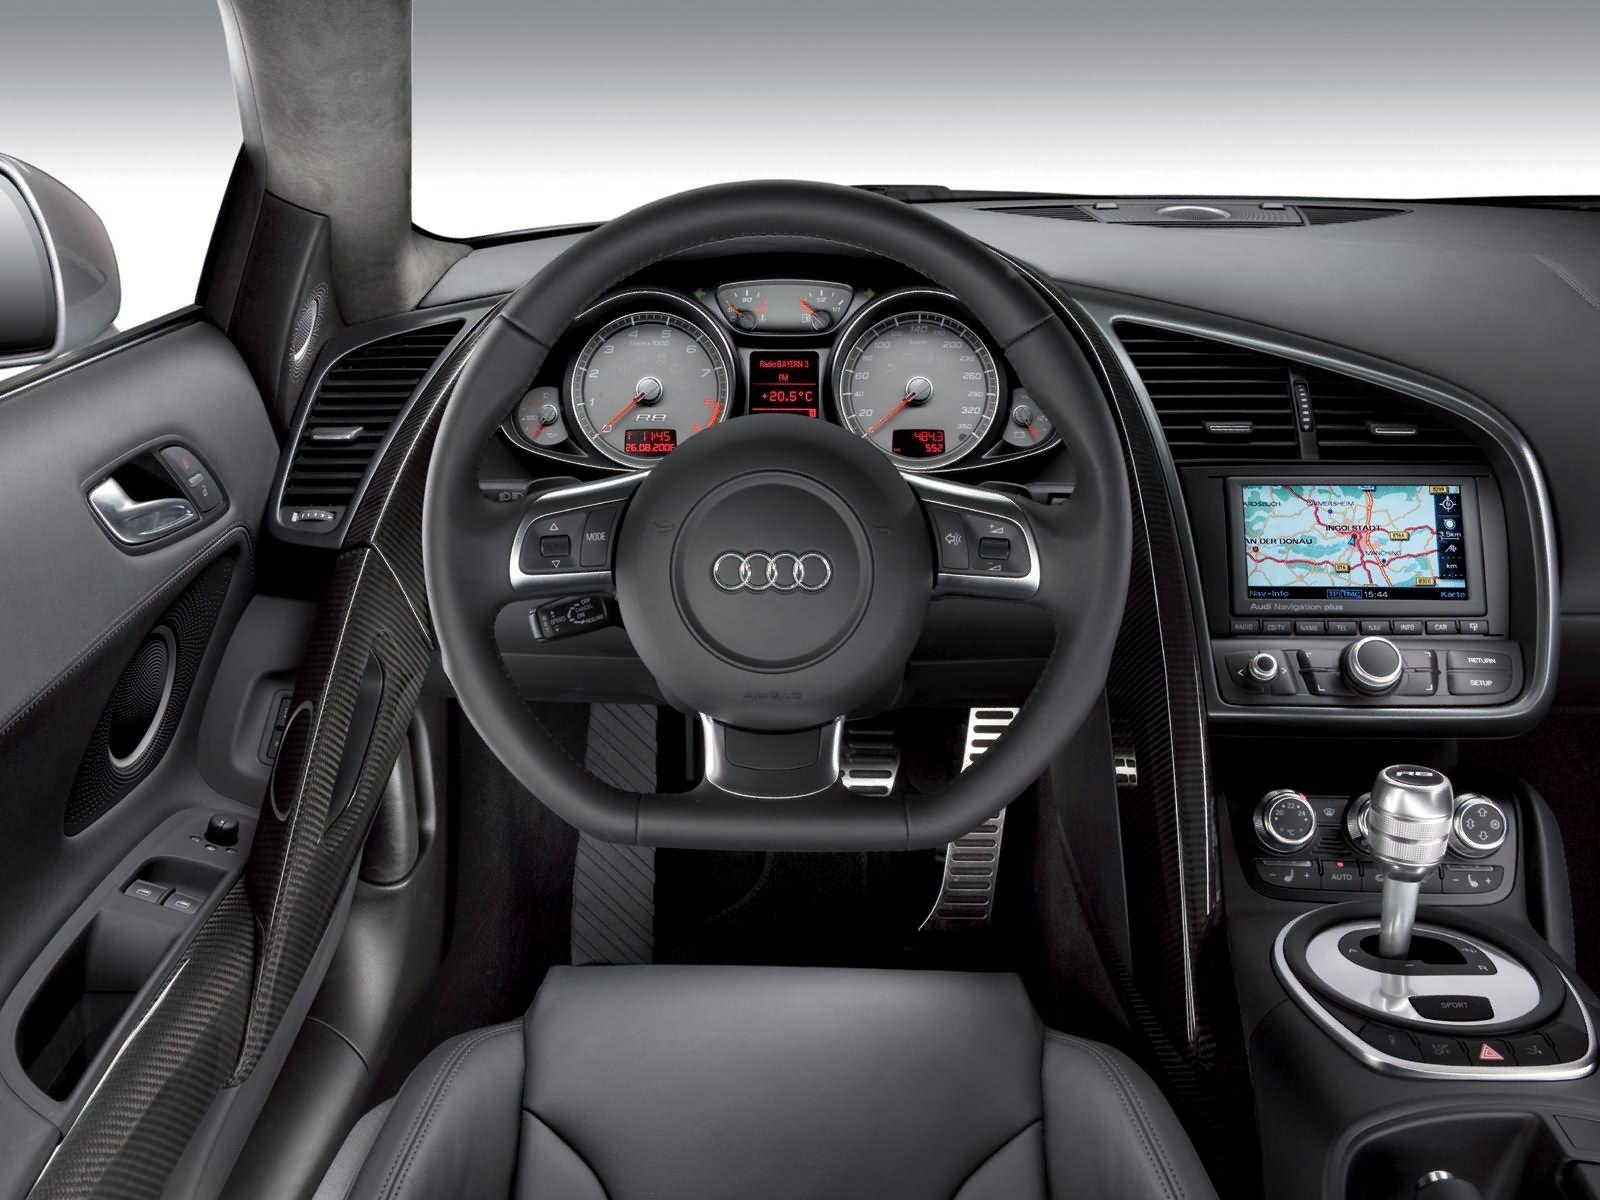 Audi R8 Interior Audi R8 Gt 2012 Audi R8 Audi R8 Interior